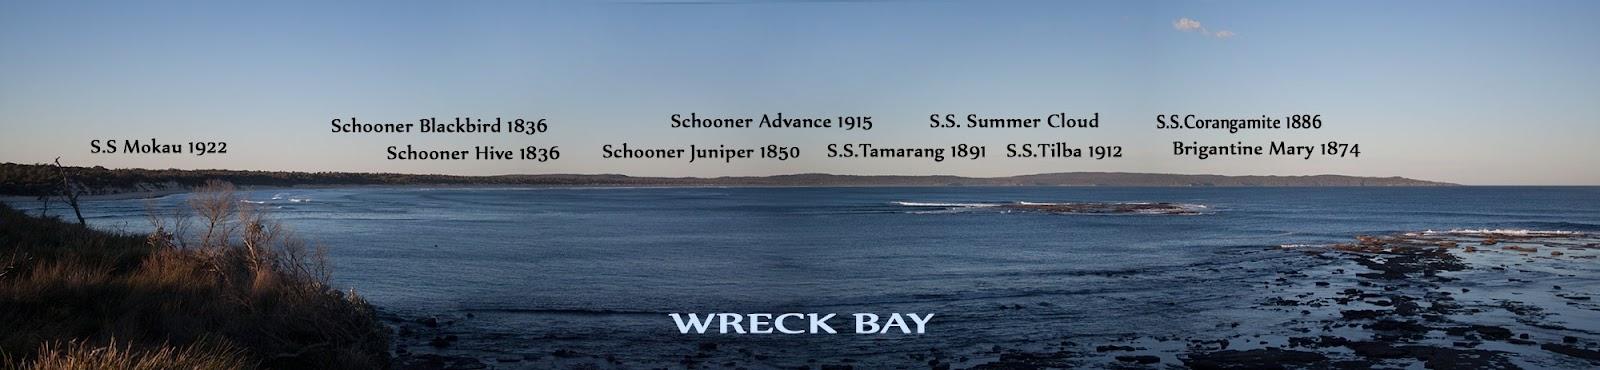 [wreck-bay-wreck-names%5B1%5D]